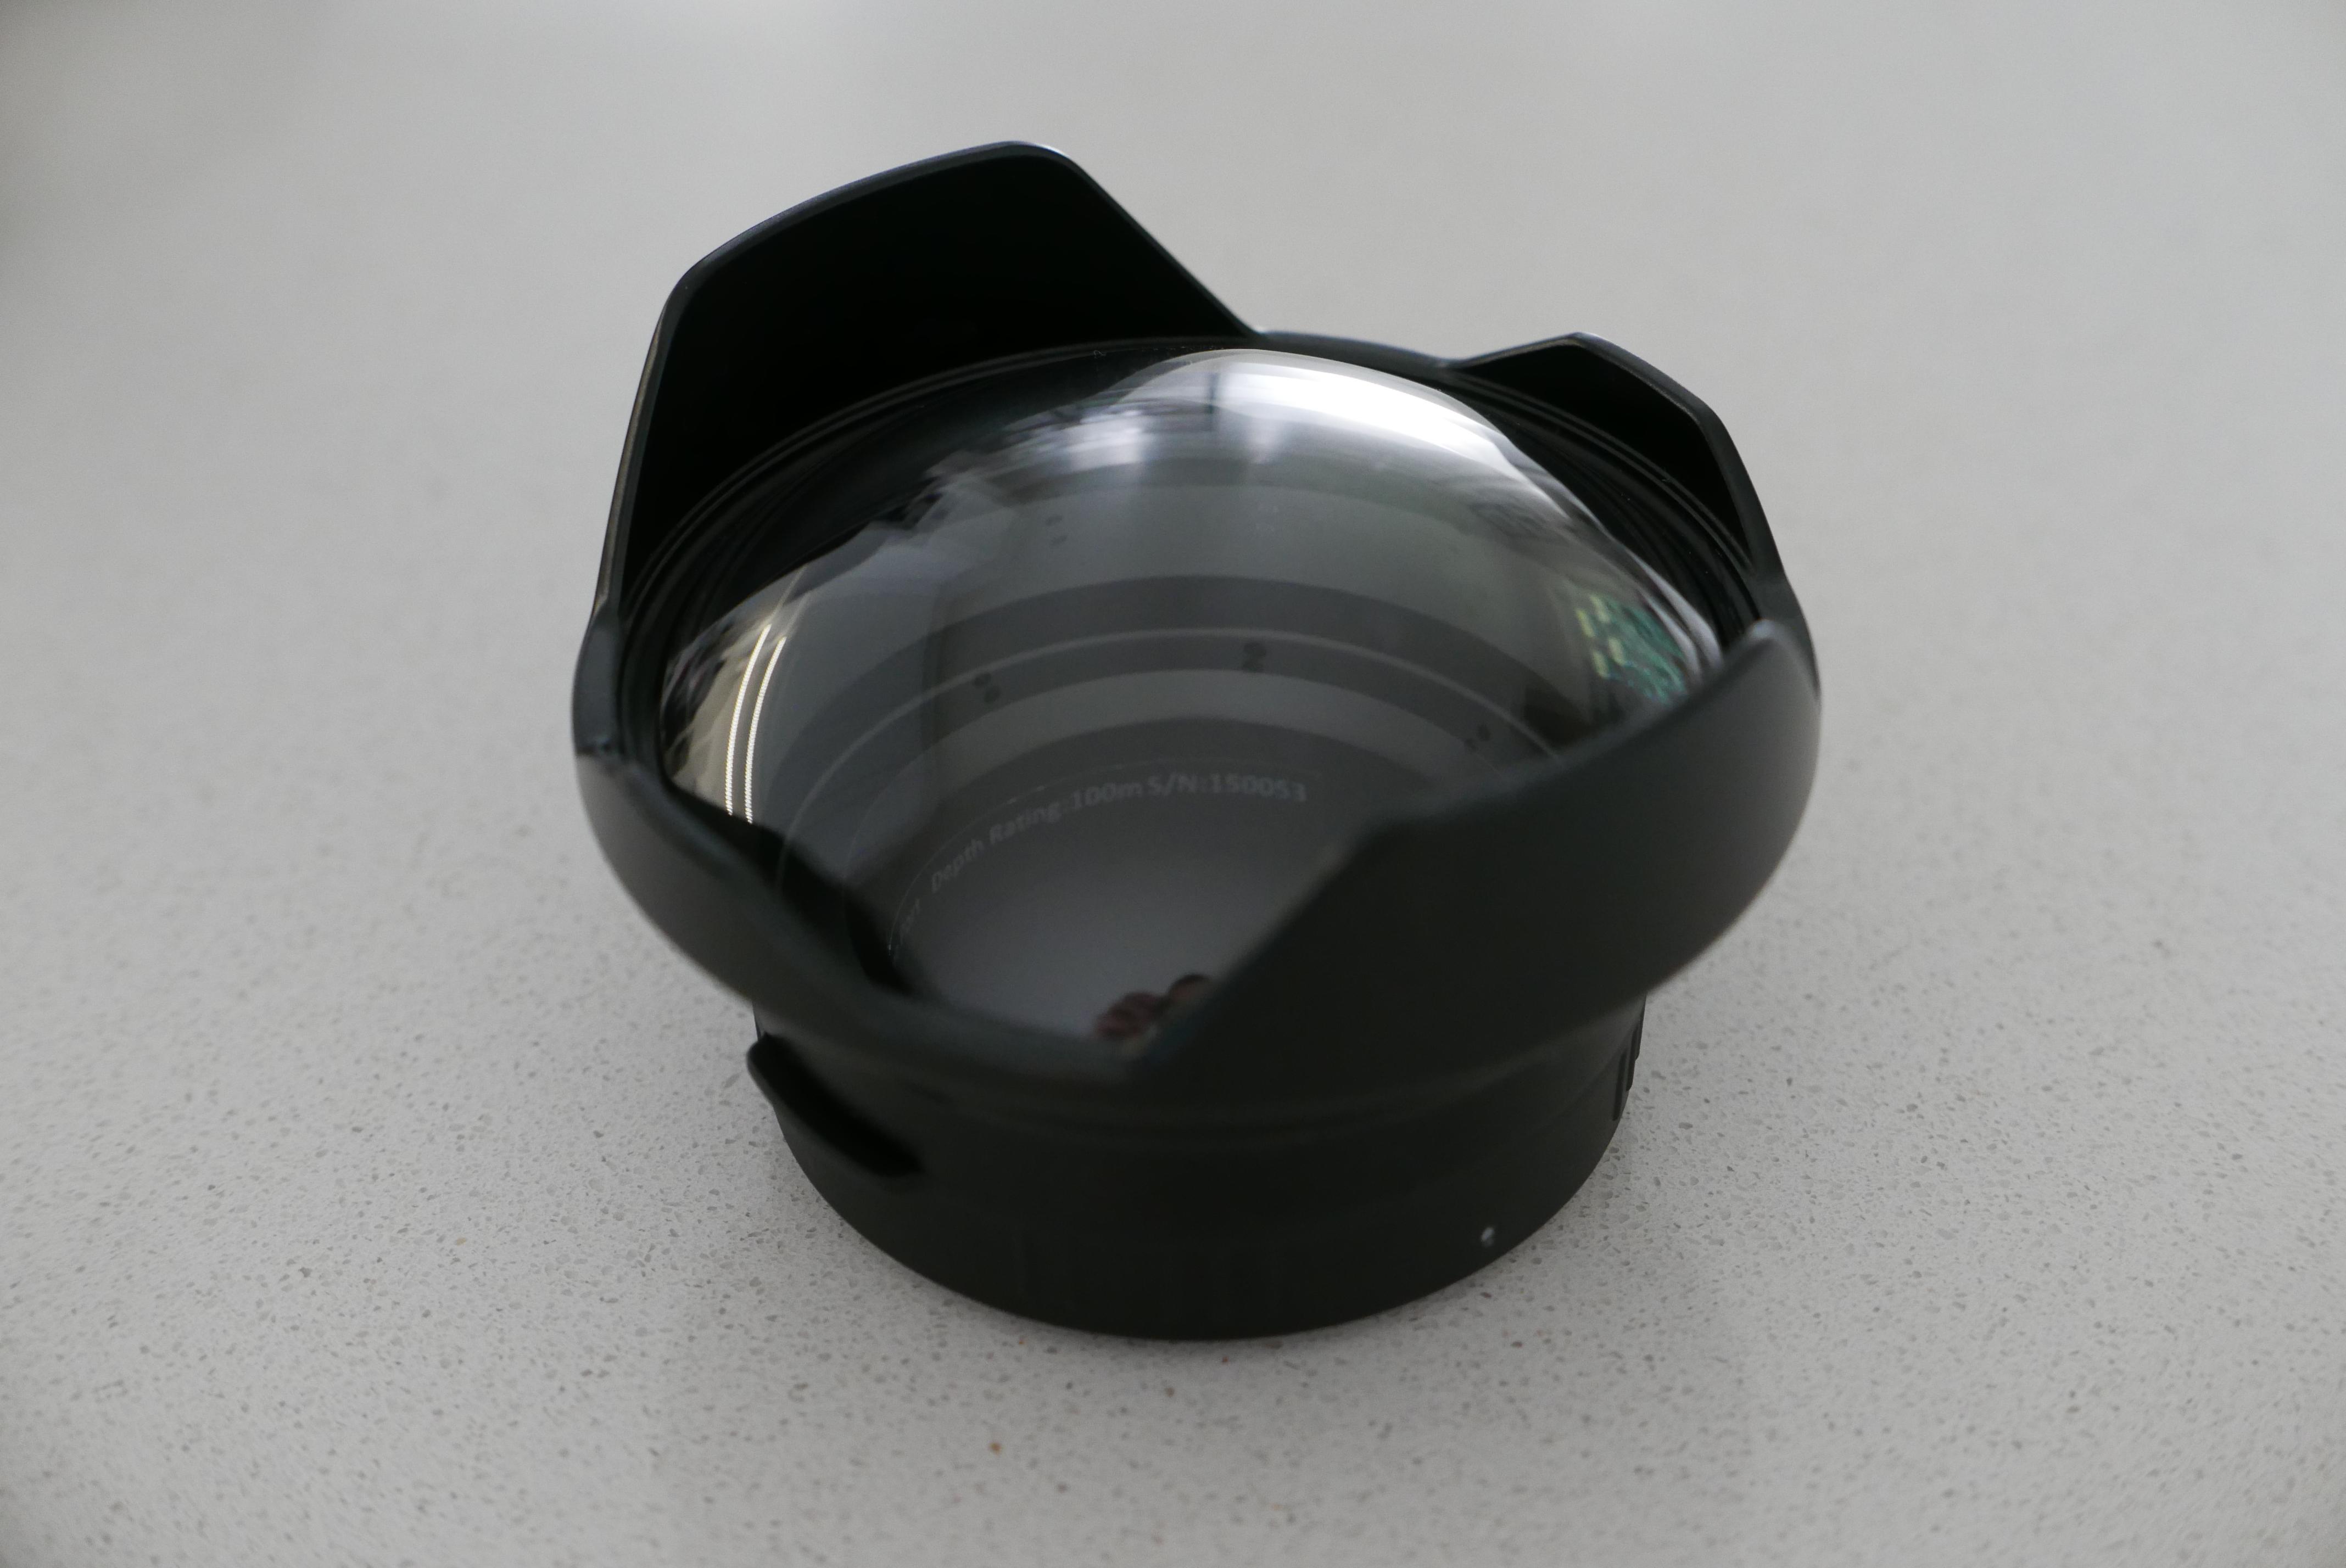 N50 3.5